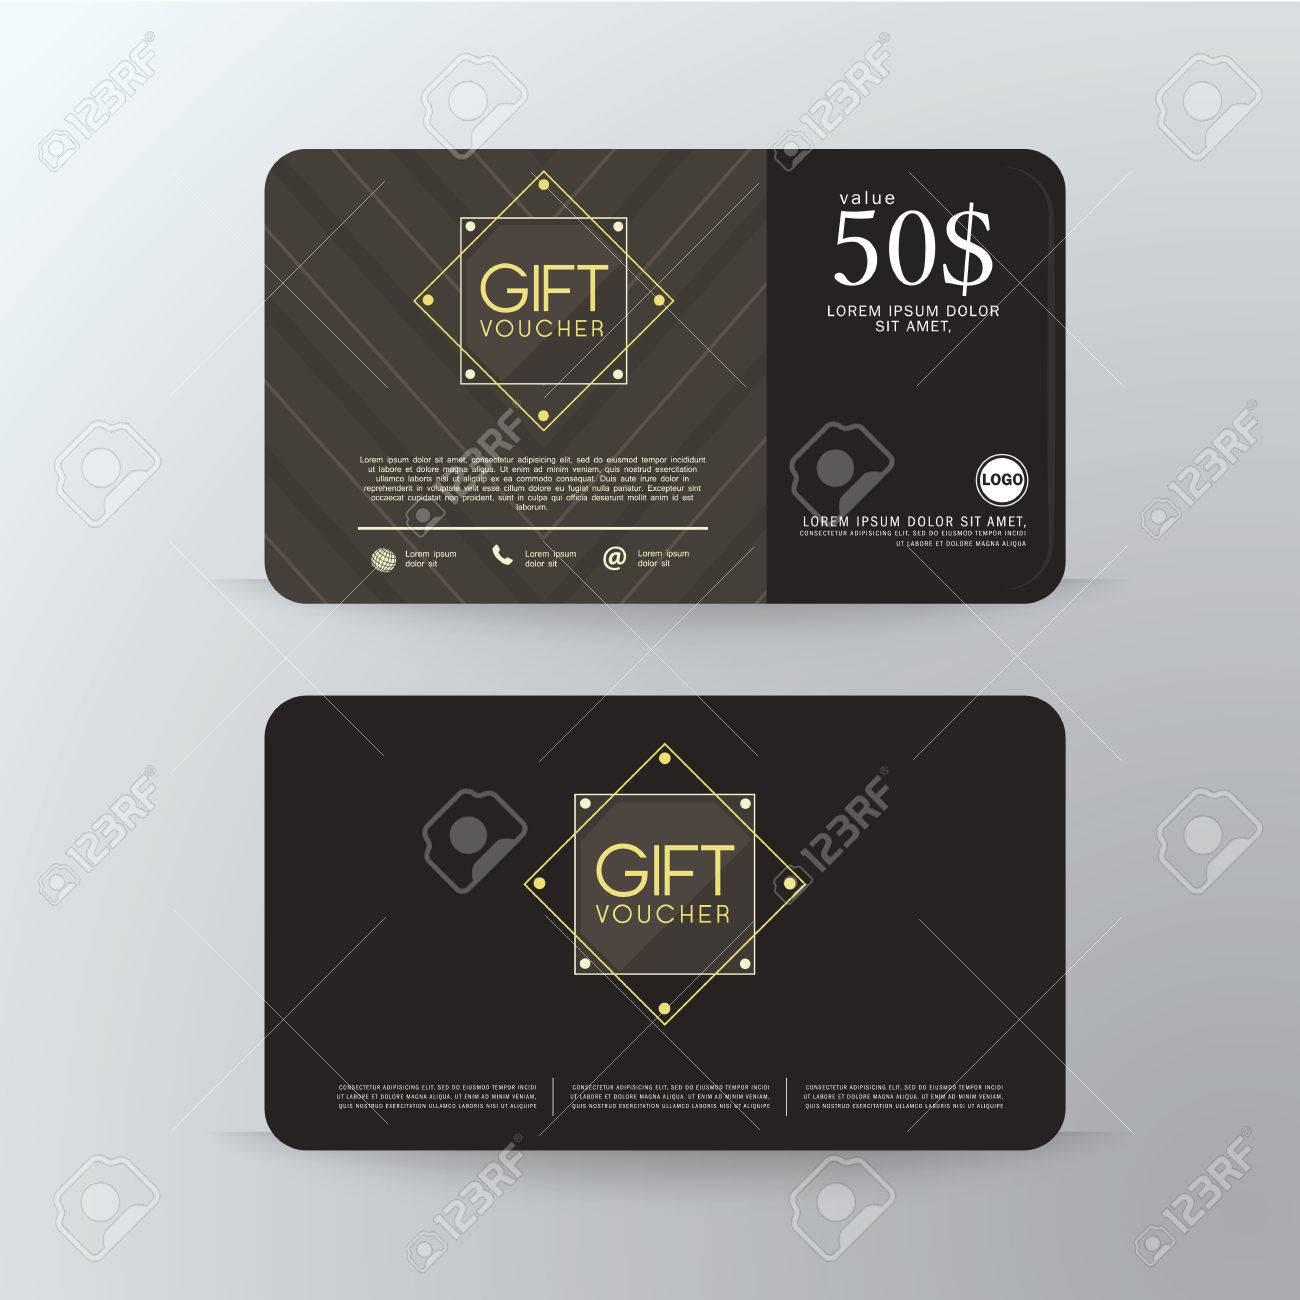 Gift Voucher Premier Cards Business Cardsft Voucher Template